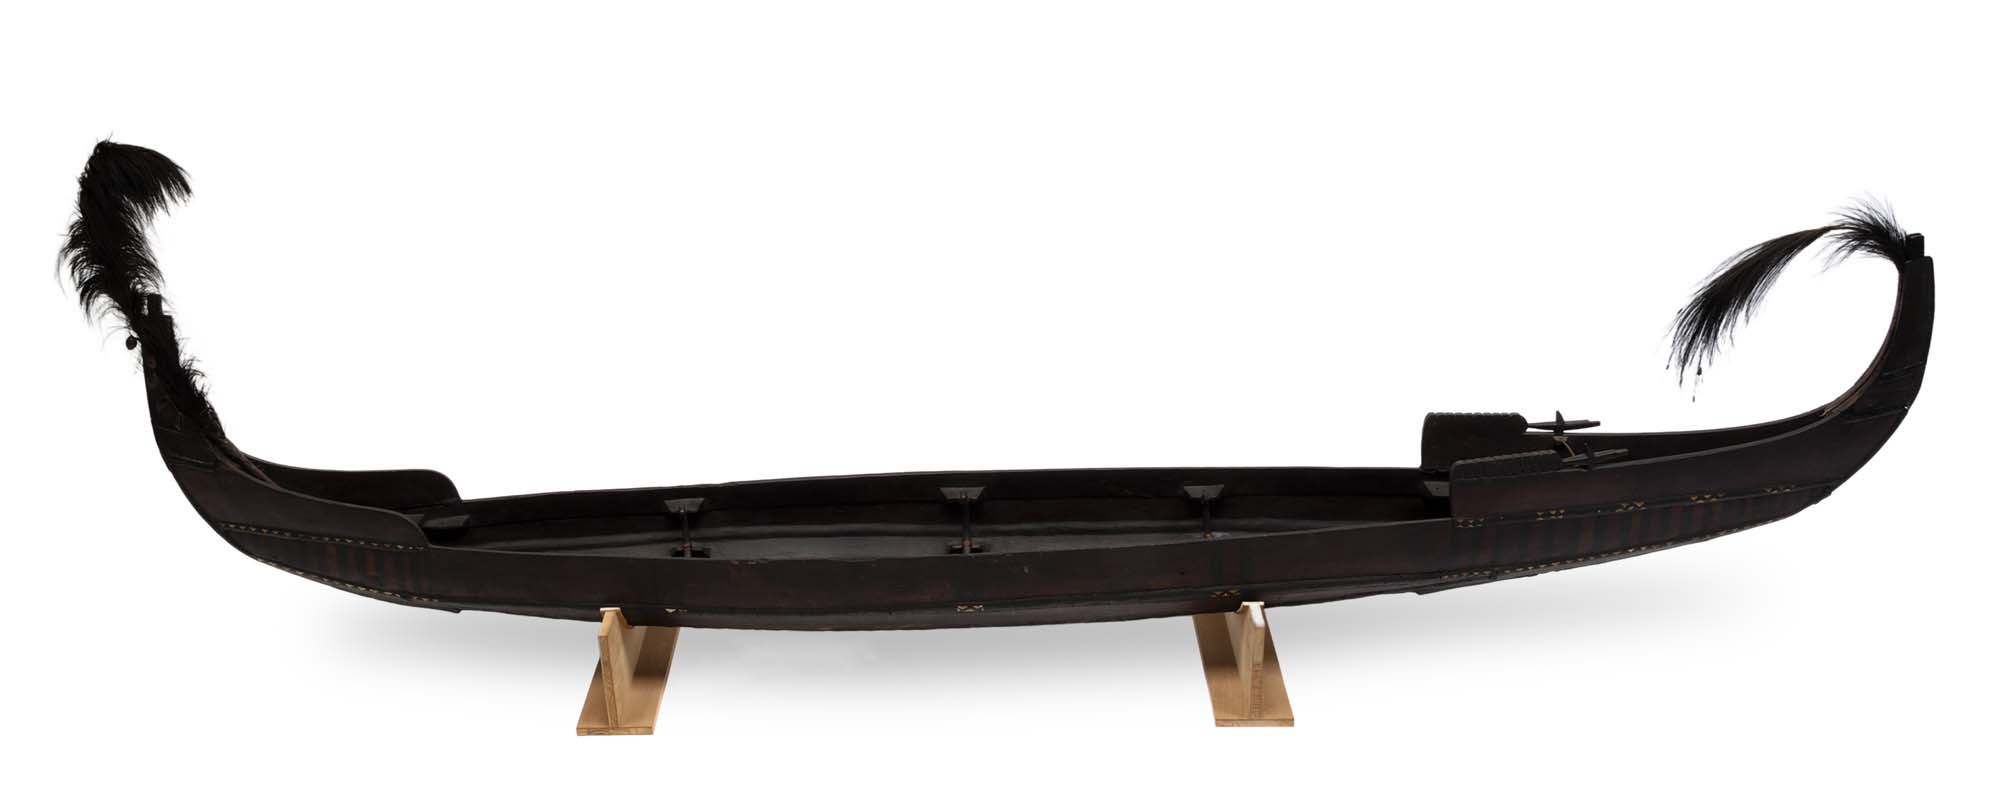 a photo of a long, slim canoe